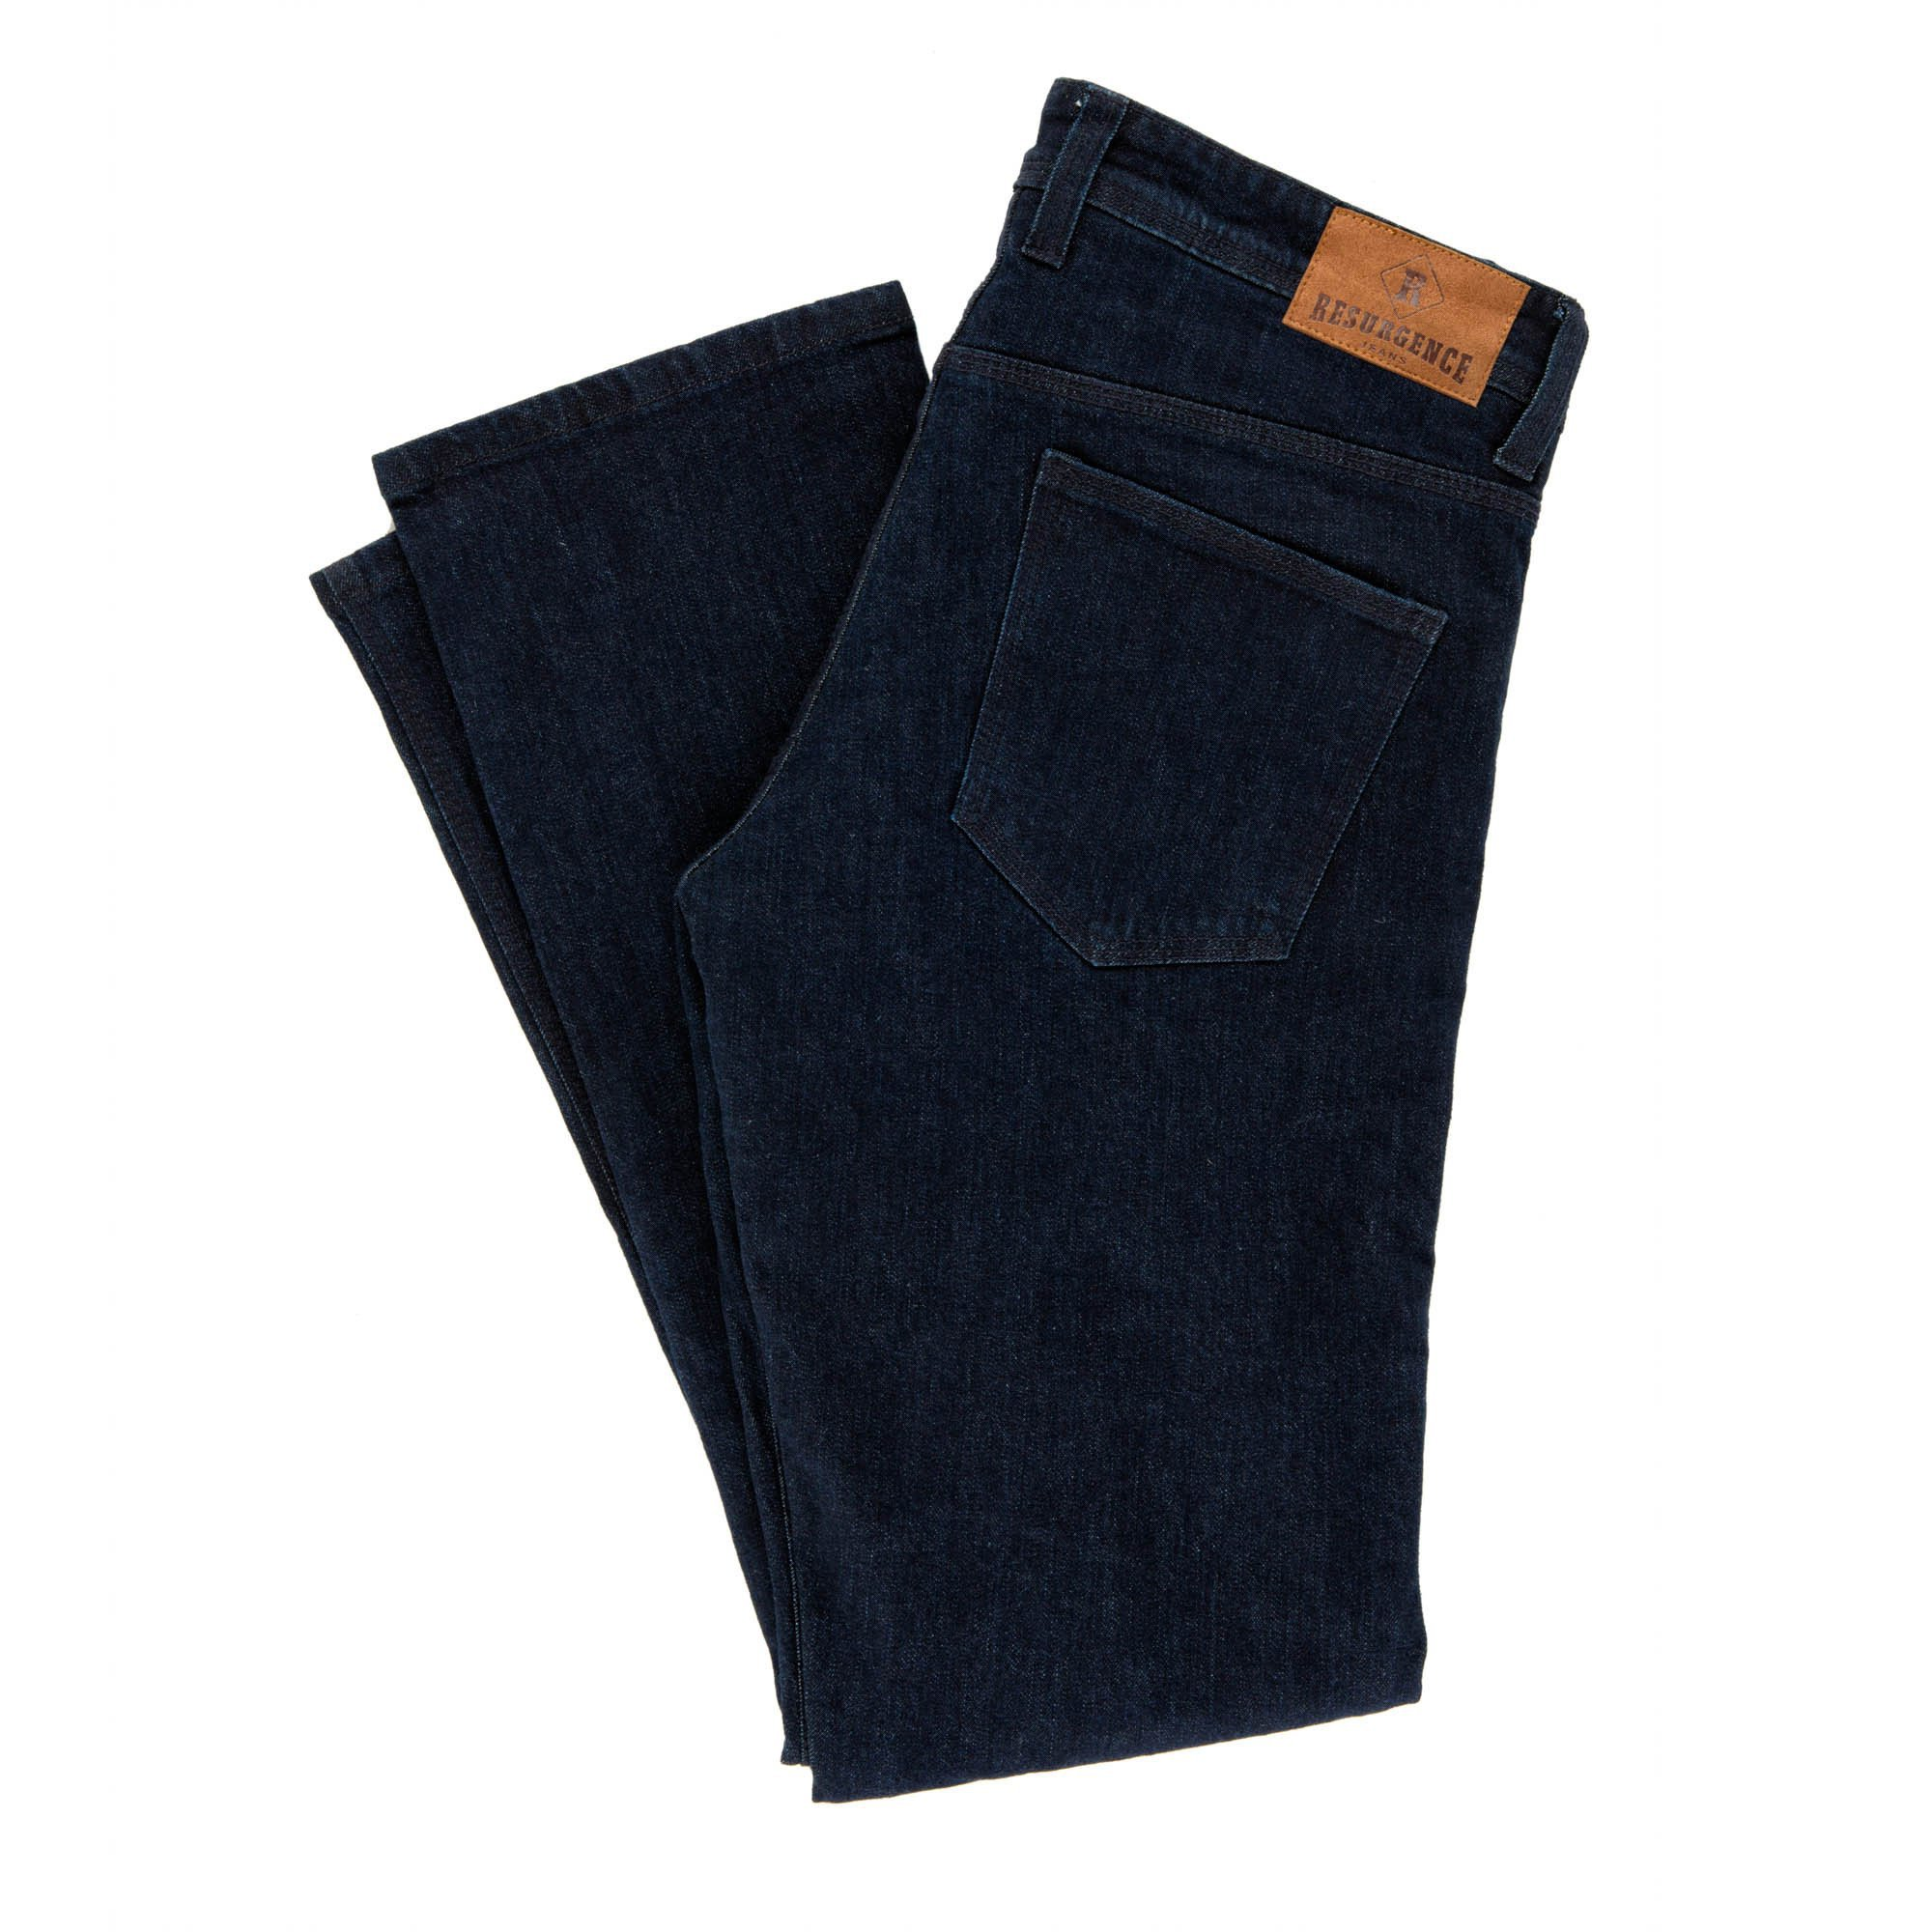 black jeans folded - Google Search